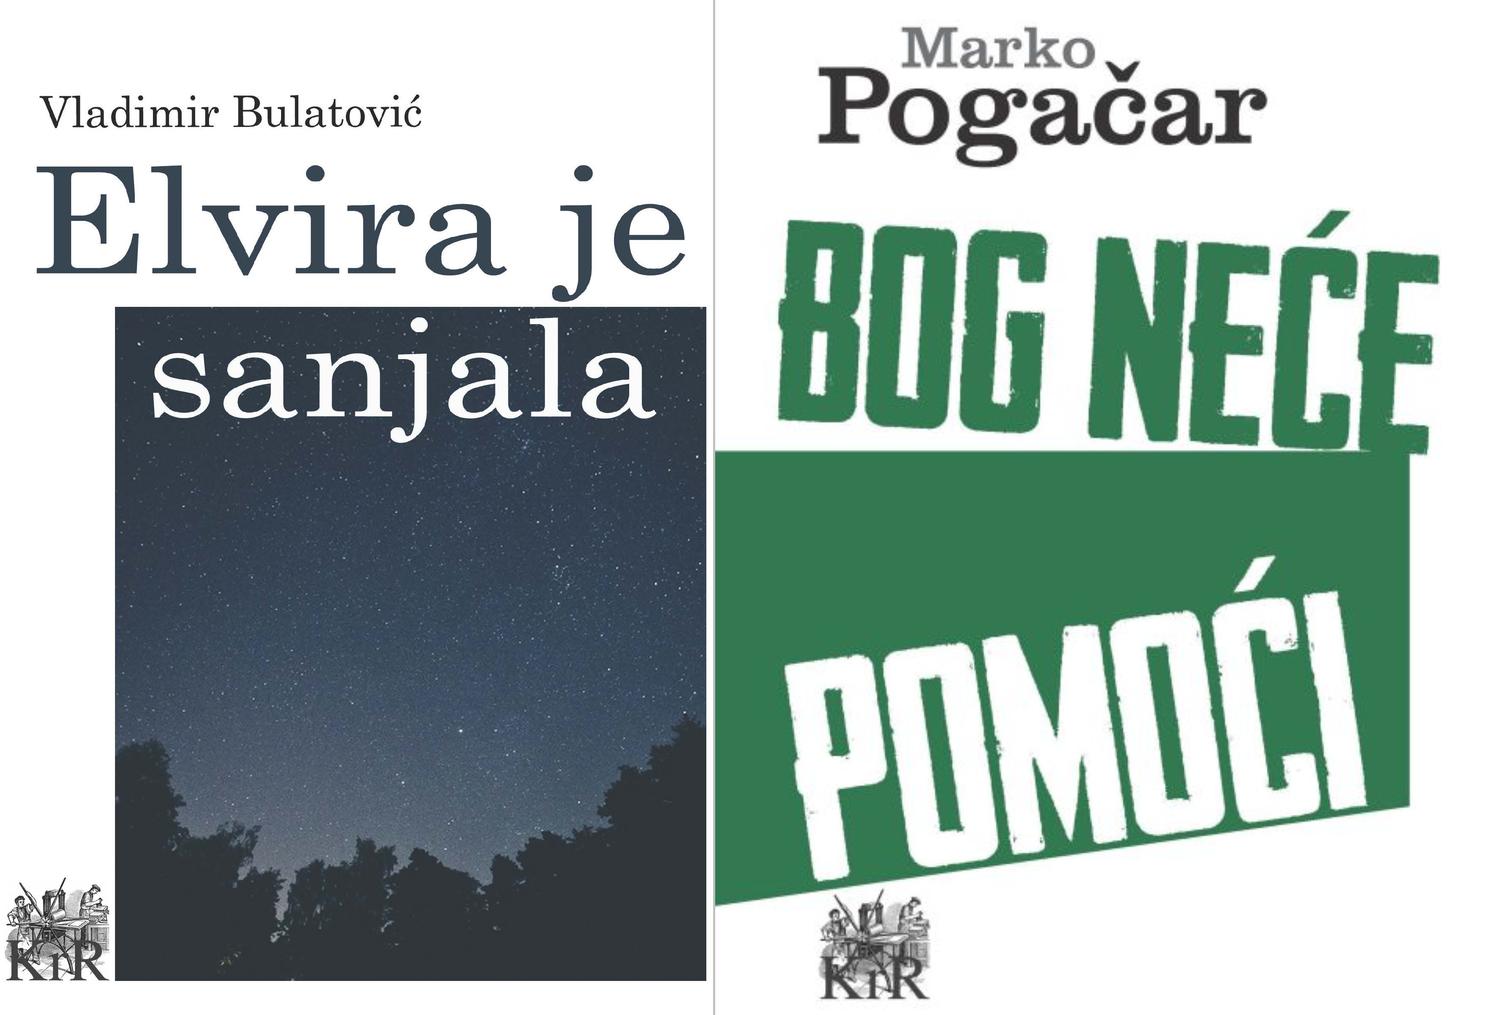 Panorama-Bulatović-Pogačar